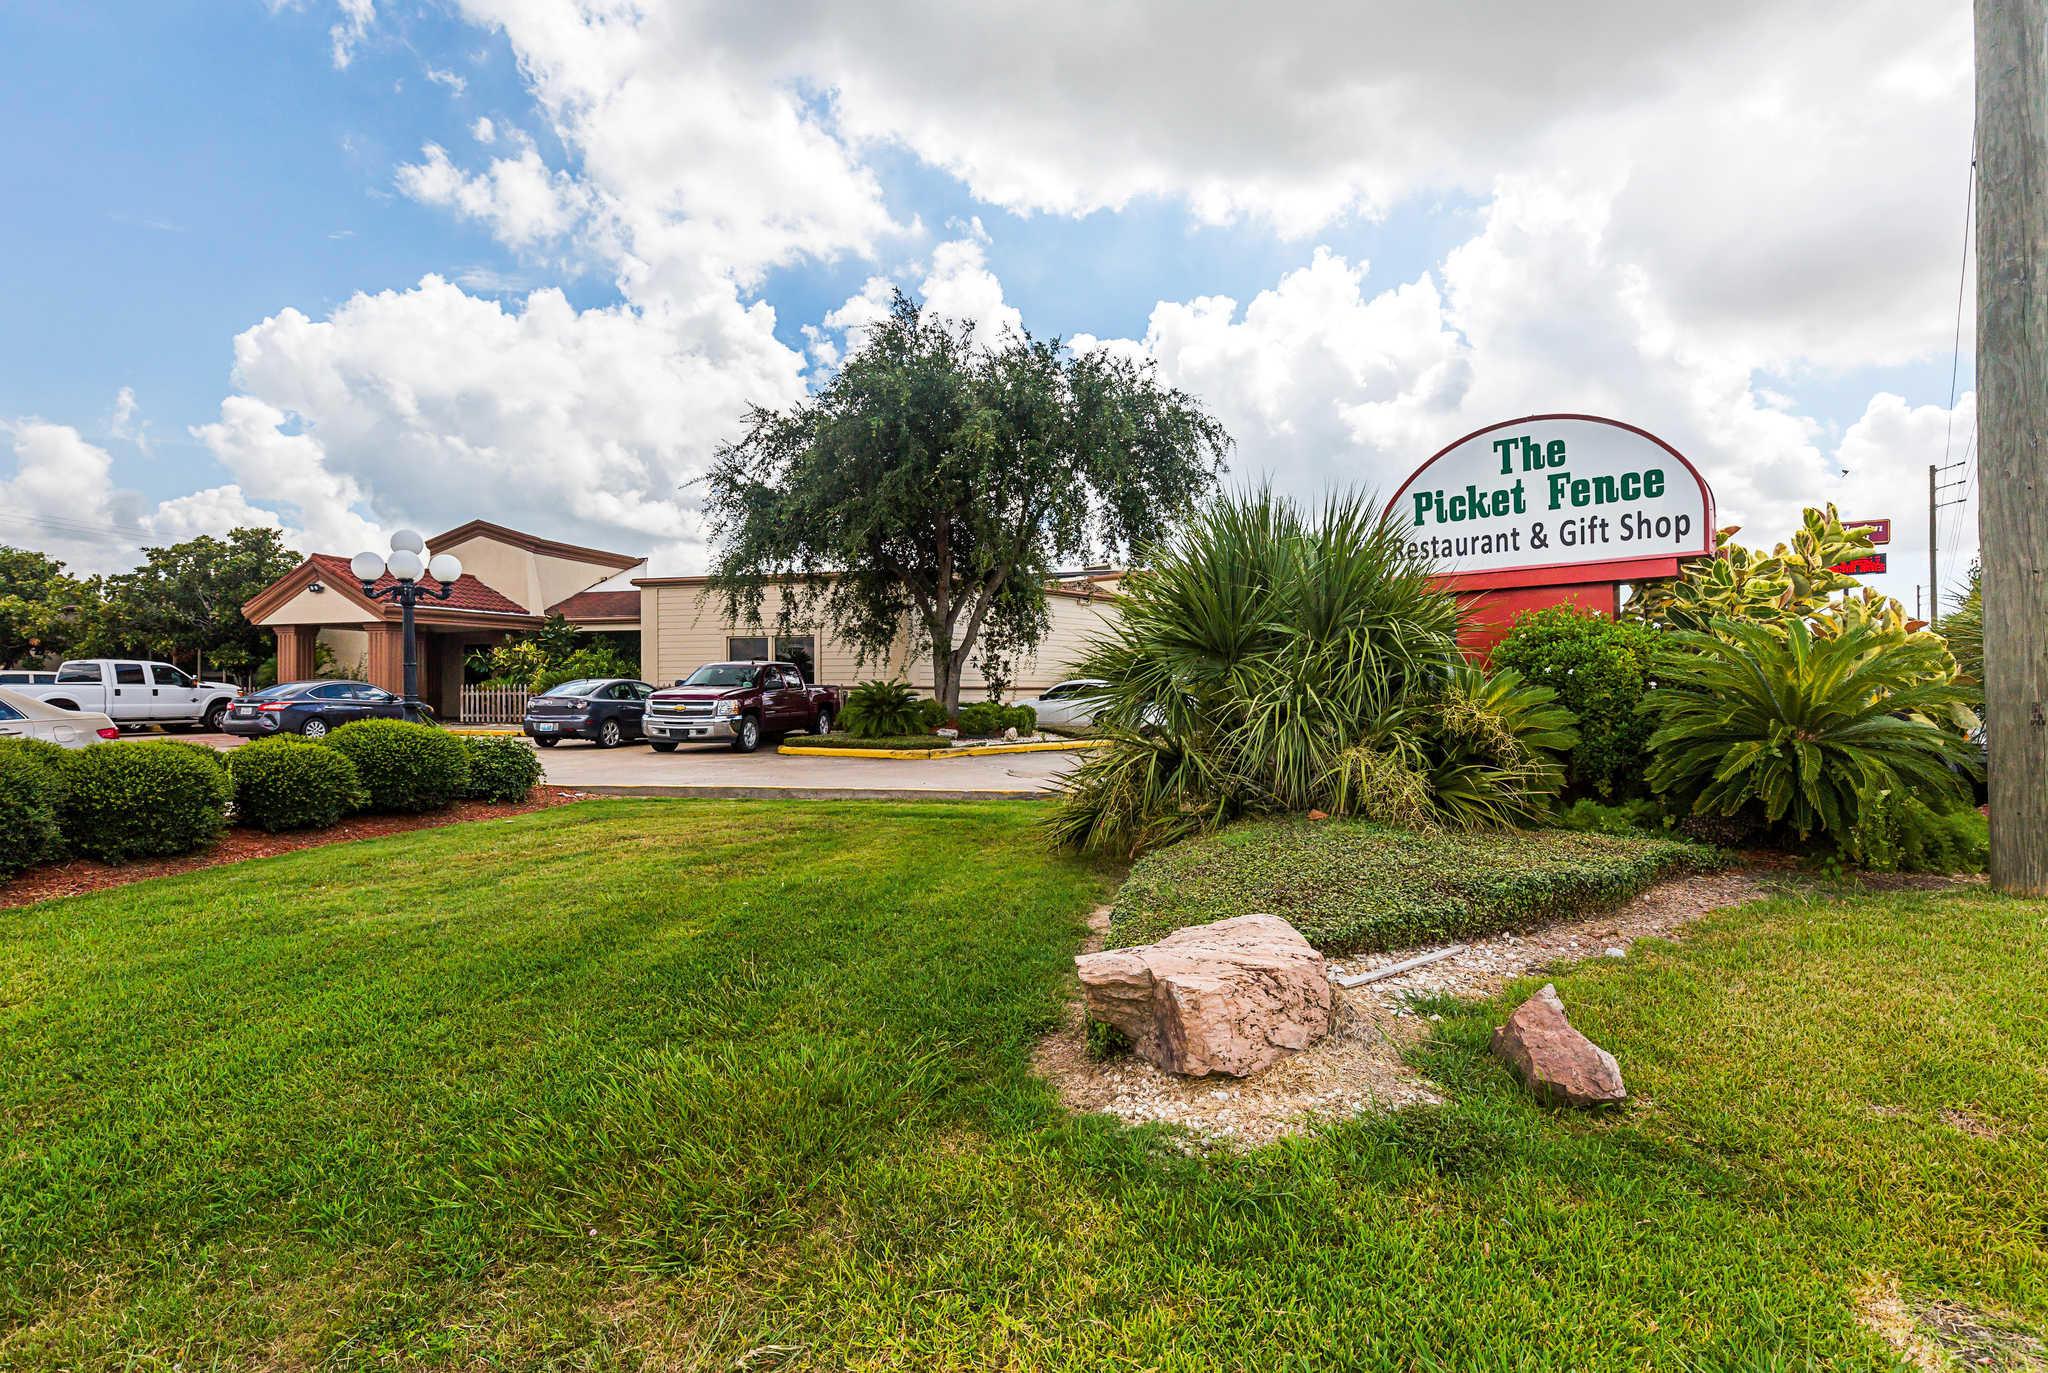 Clarion Inn image 43